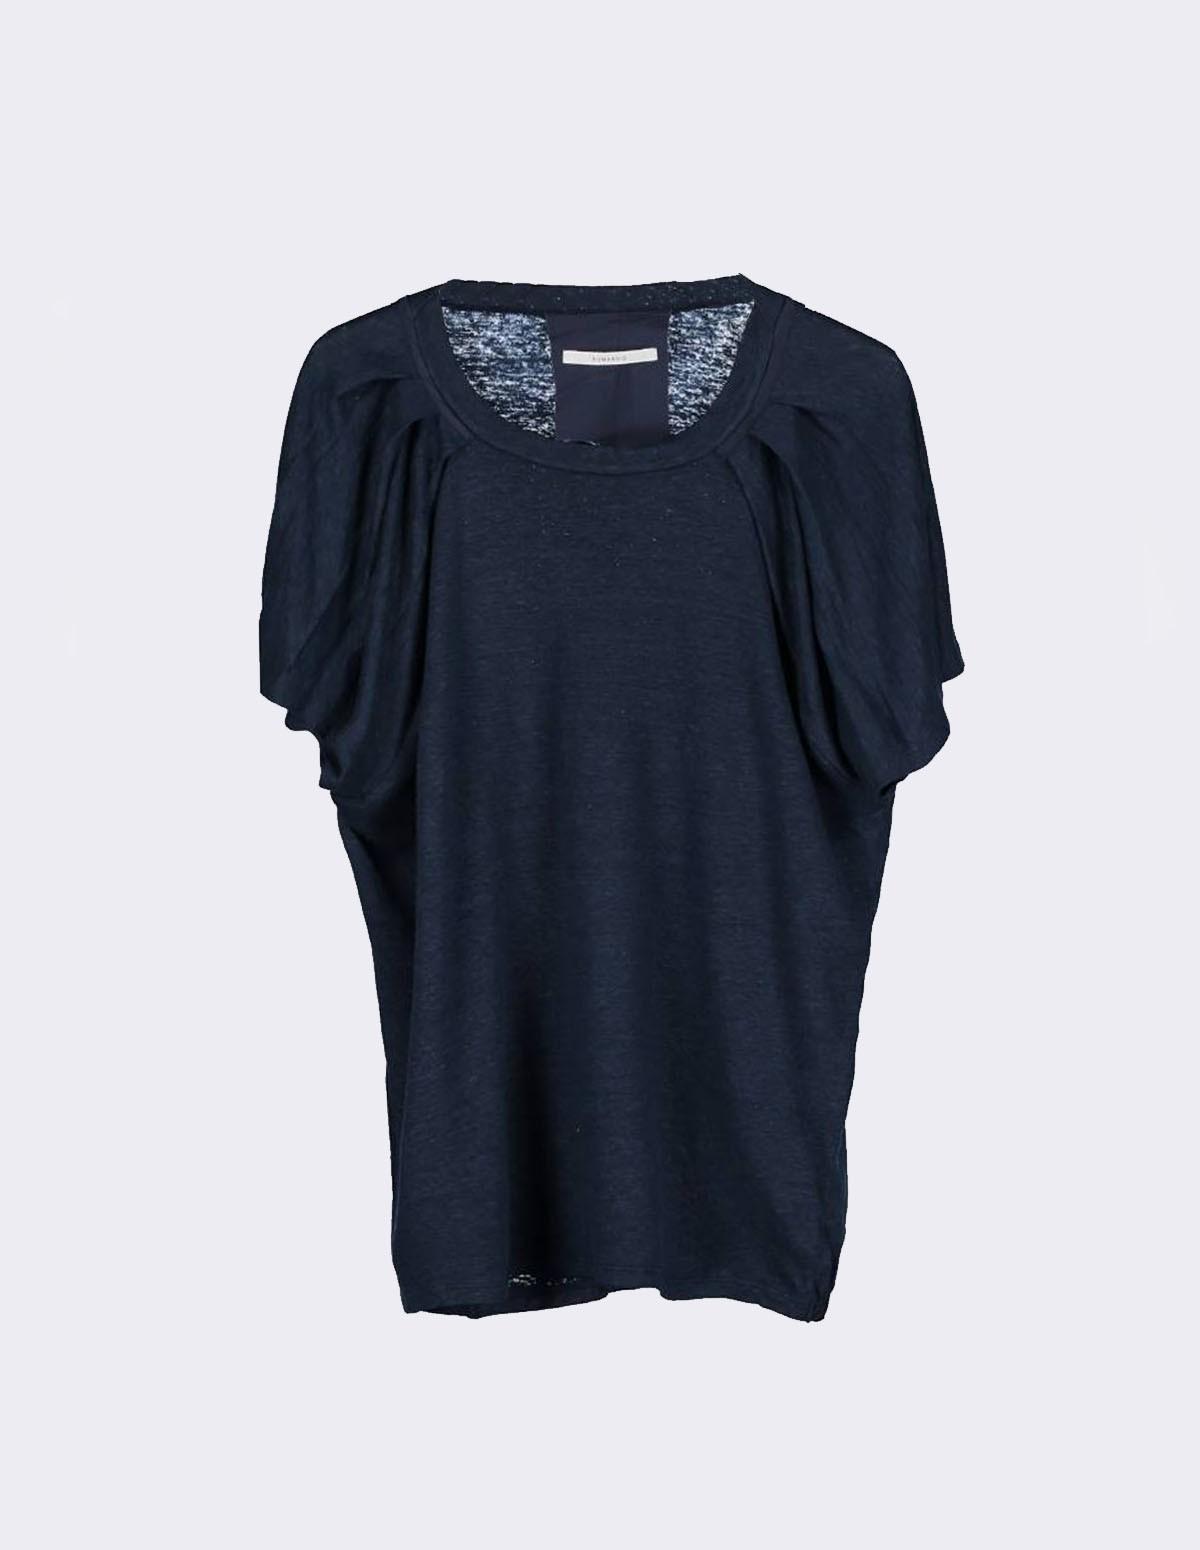 Huma Sonja Tee Shirt - NAVY